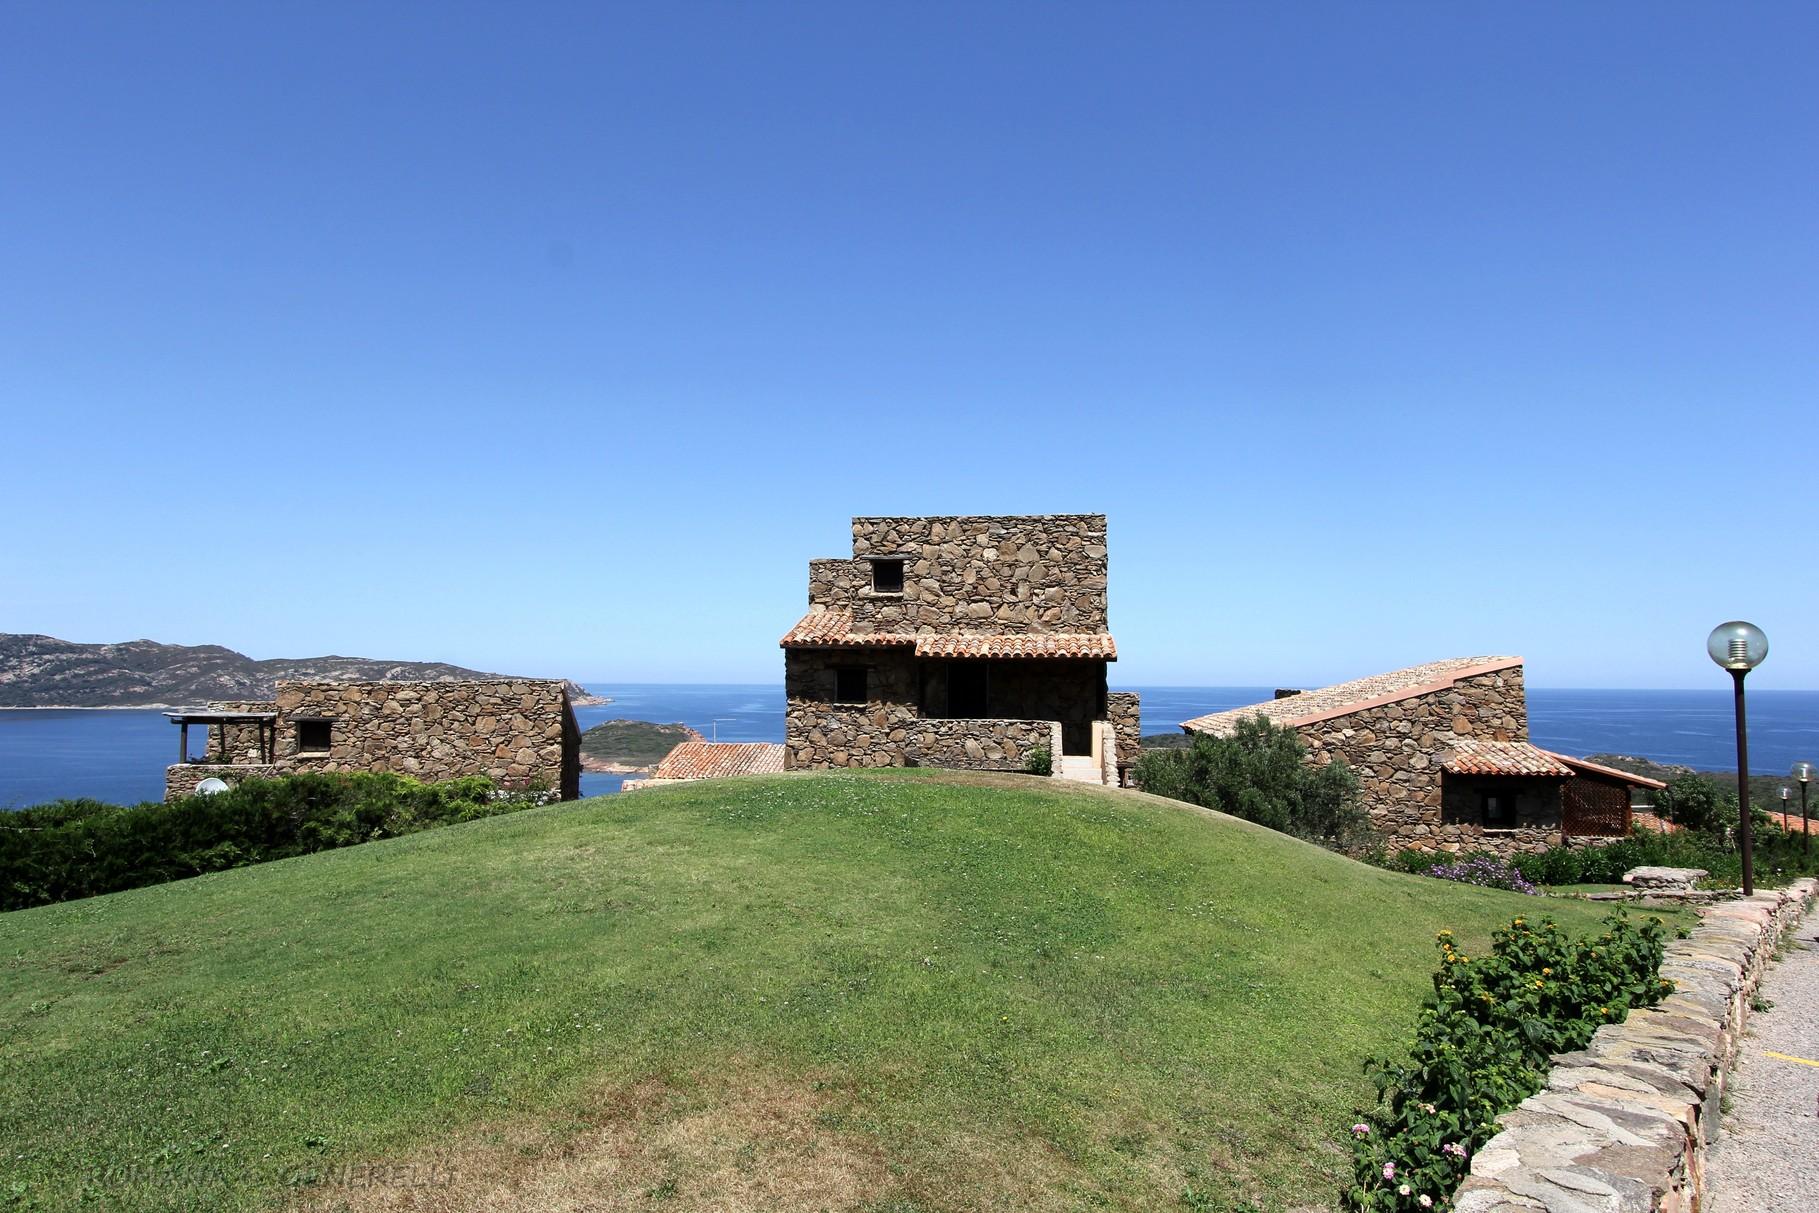 Le case Sarde